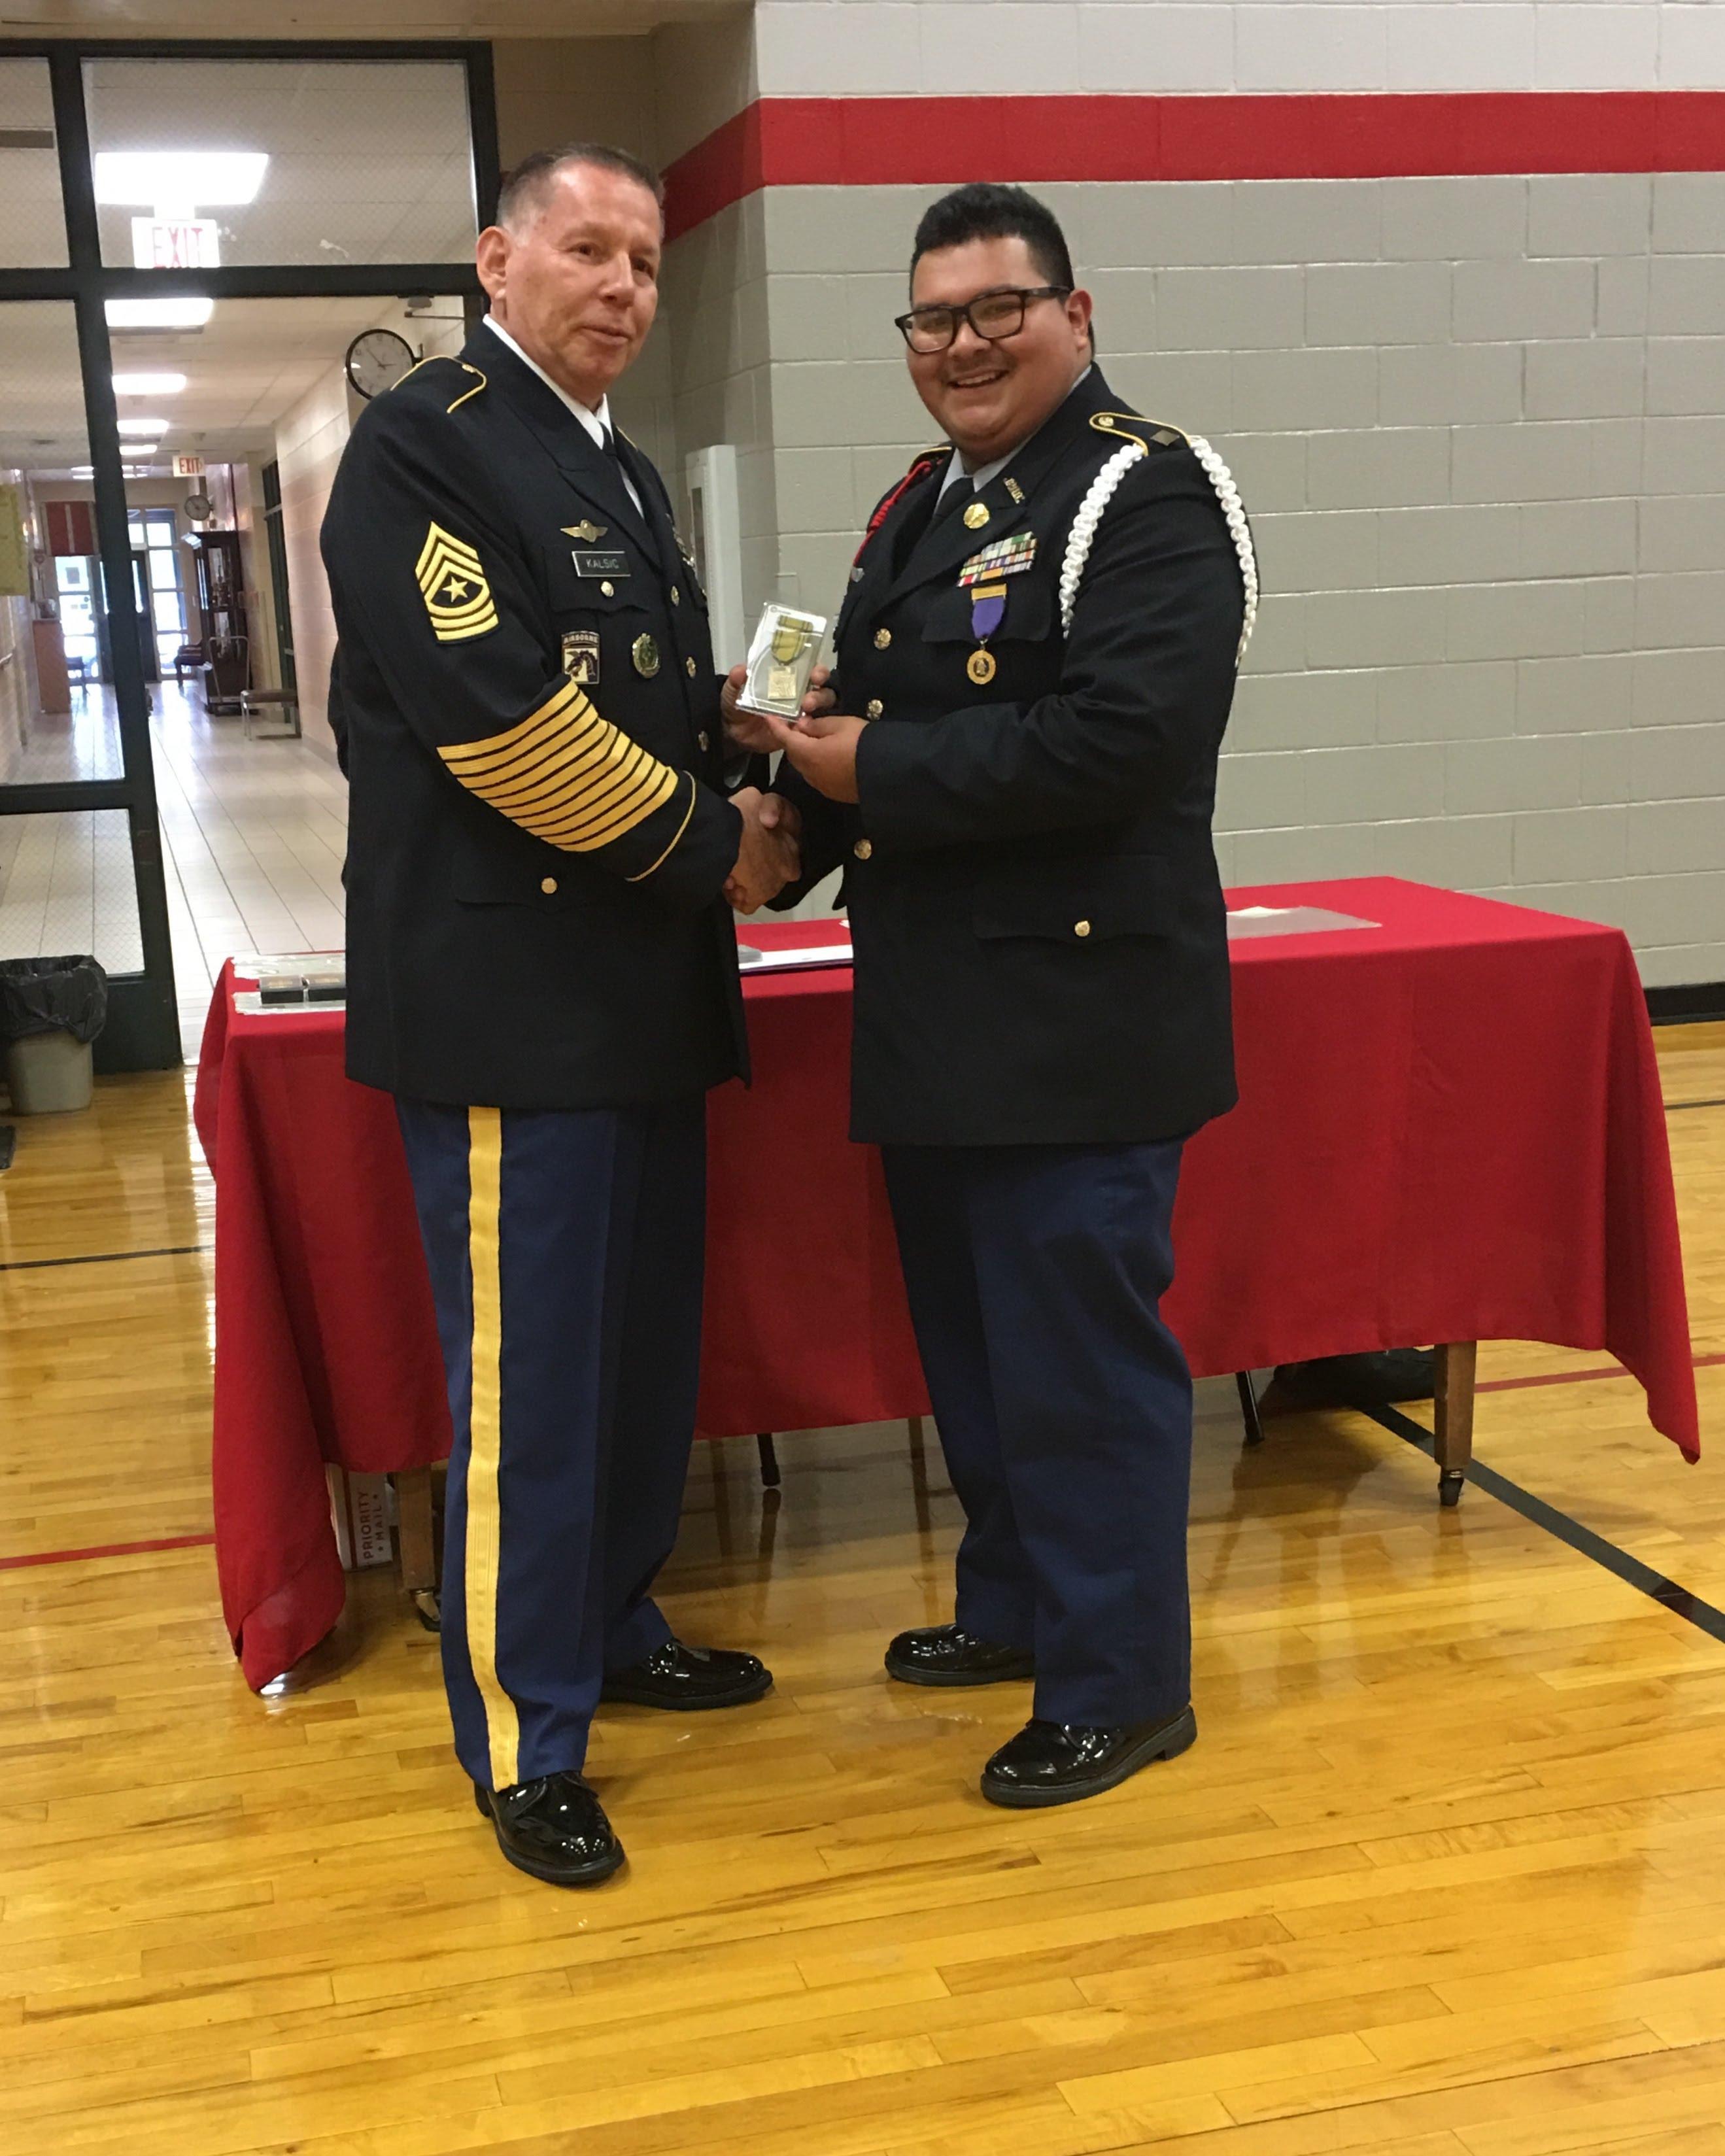 Battalion Awards Day